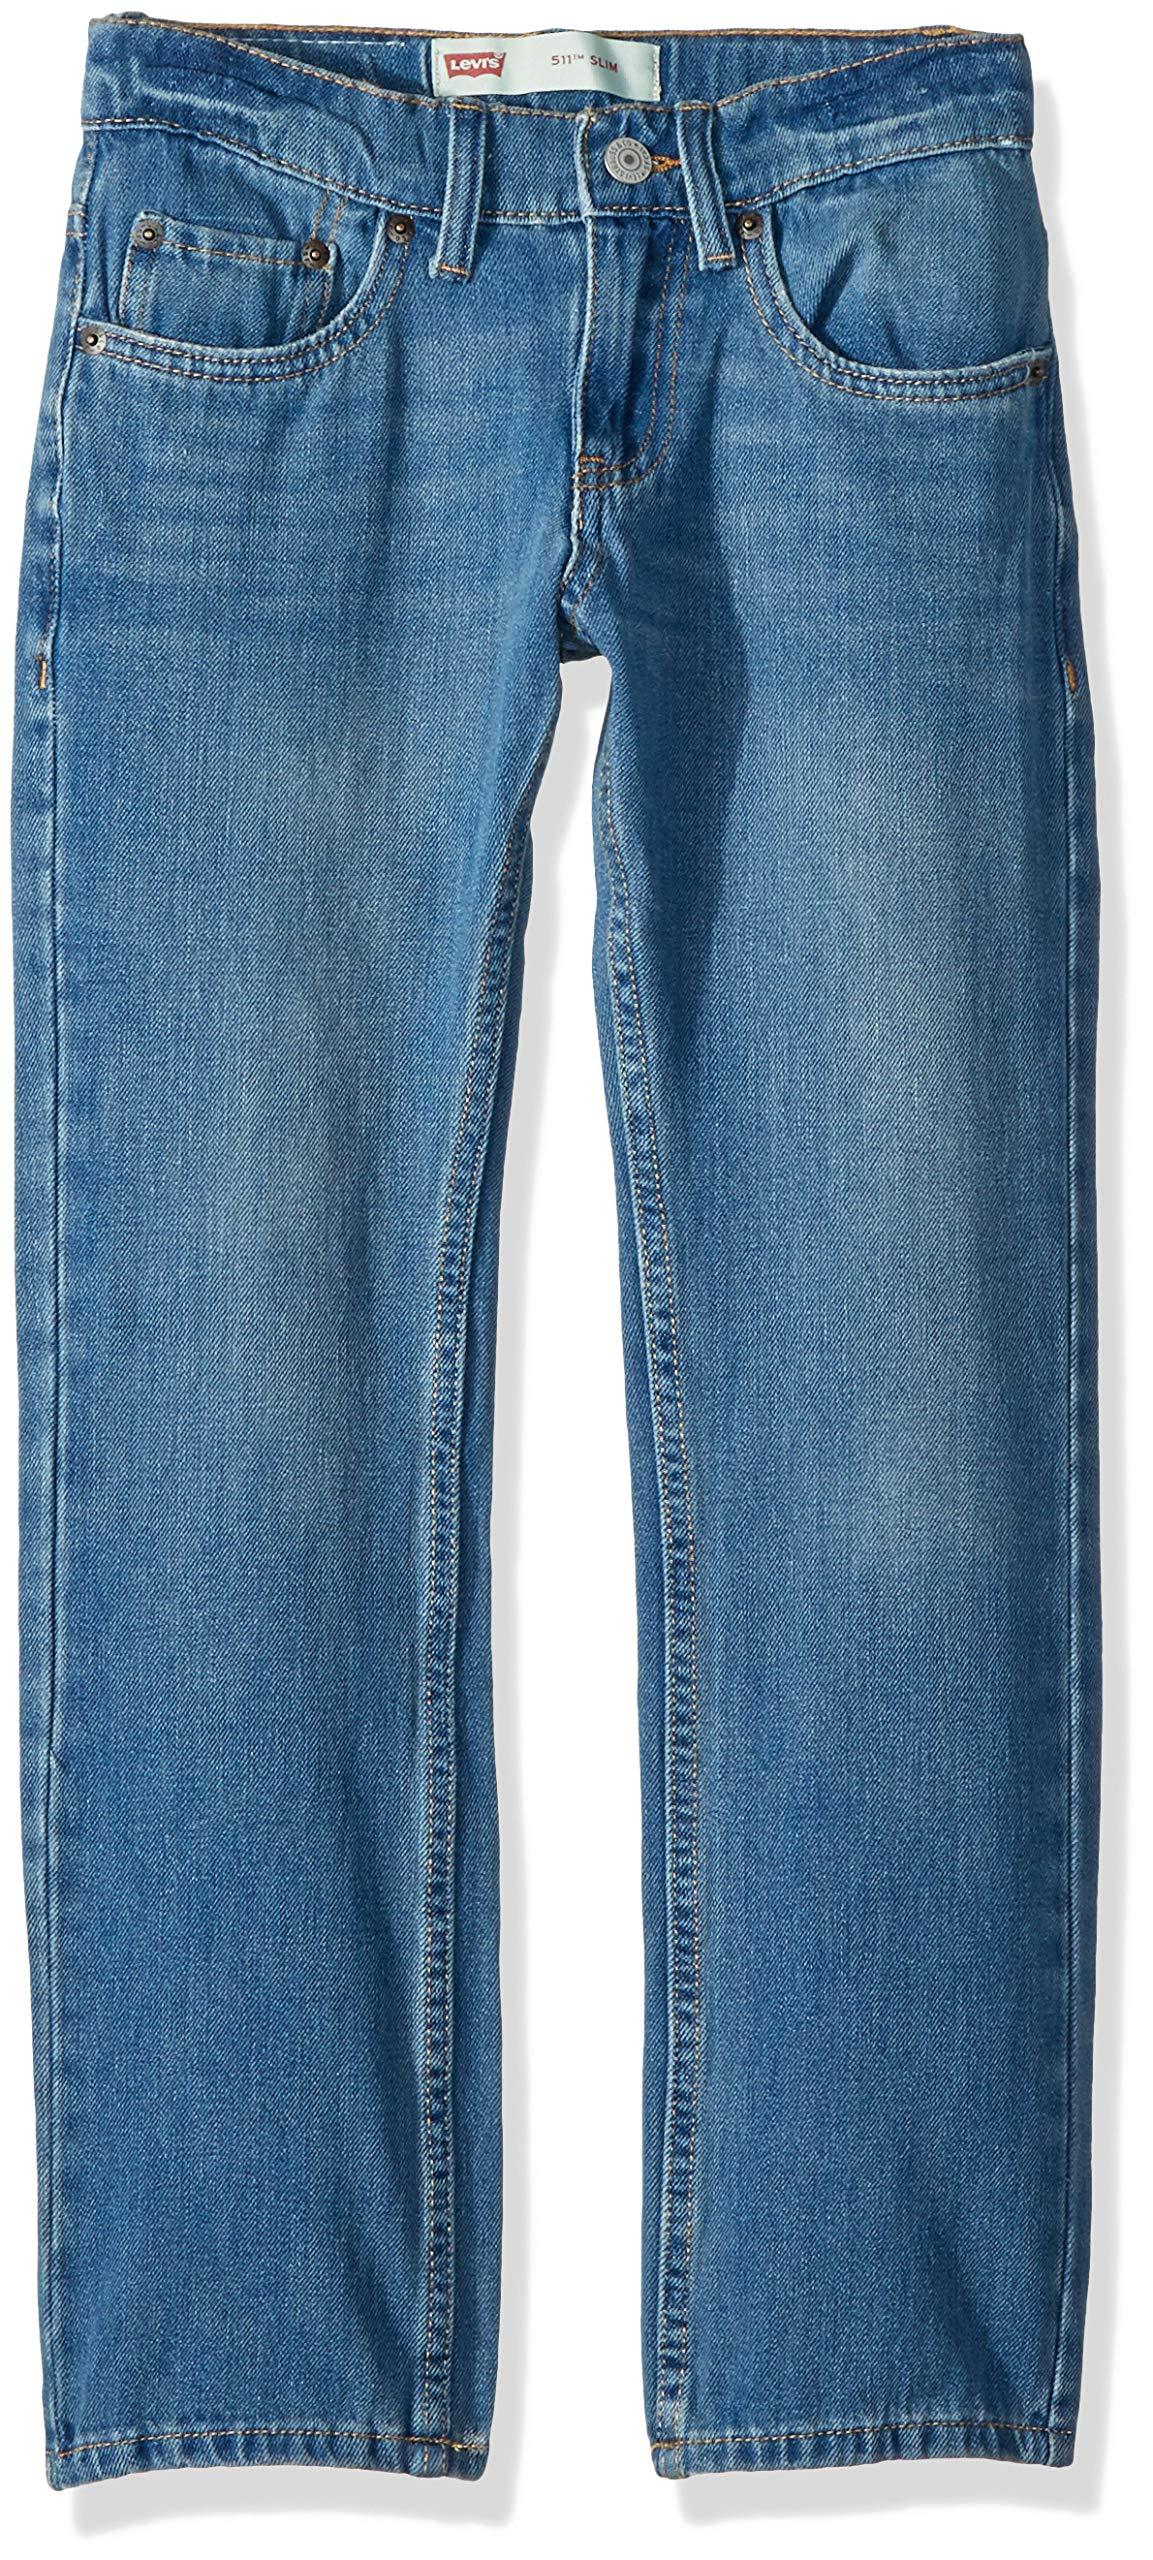 Levi's Boys' Big 511 Slim Fit Performance Jeans, Dallas 14